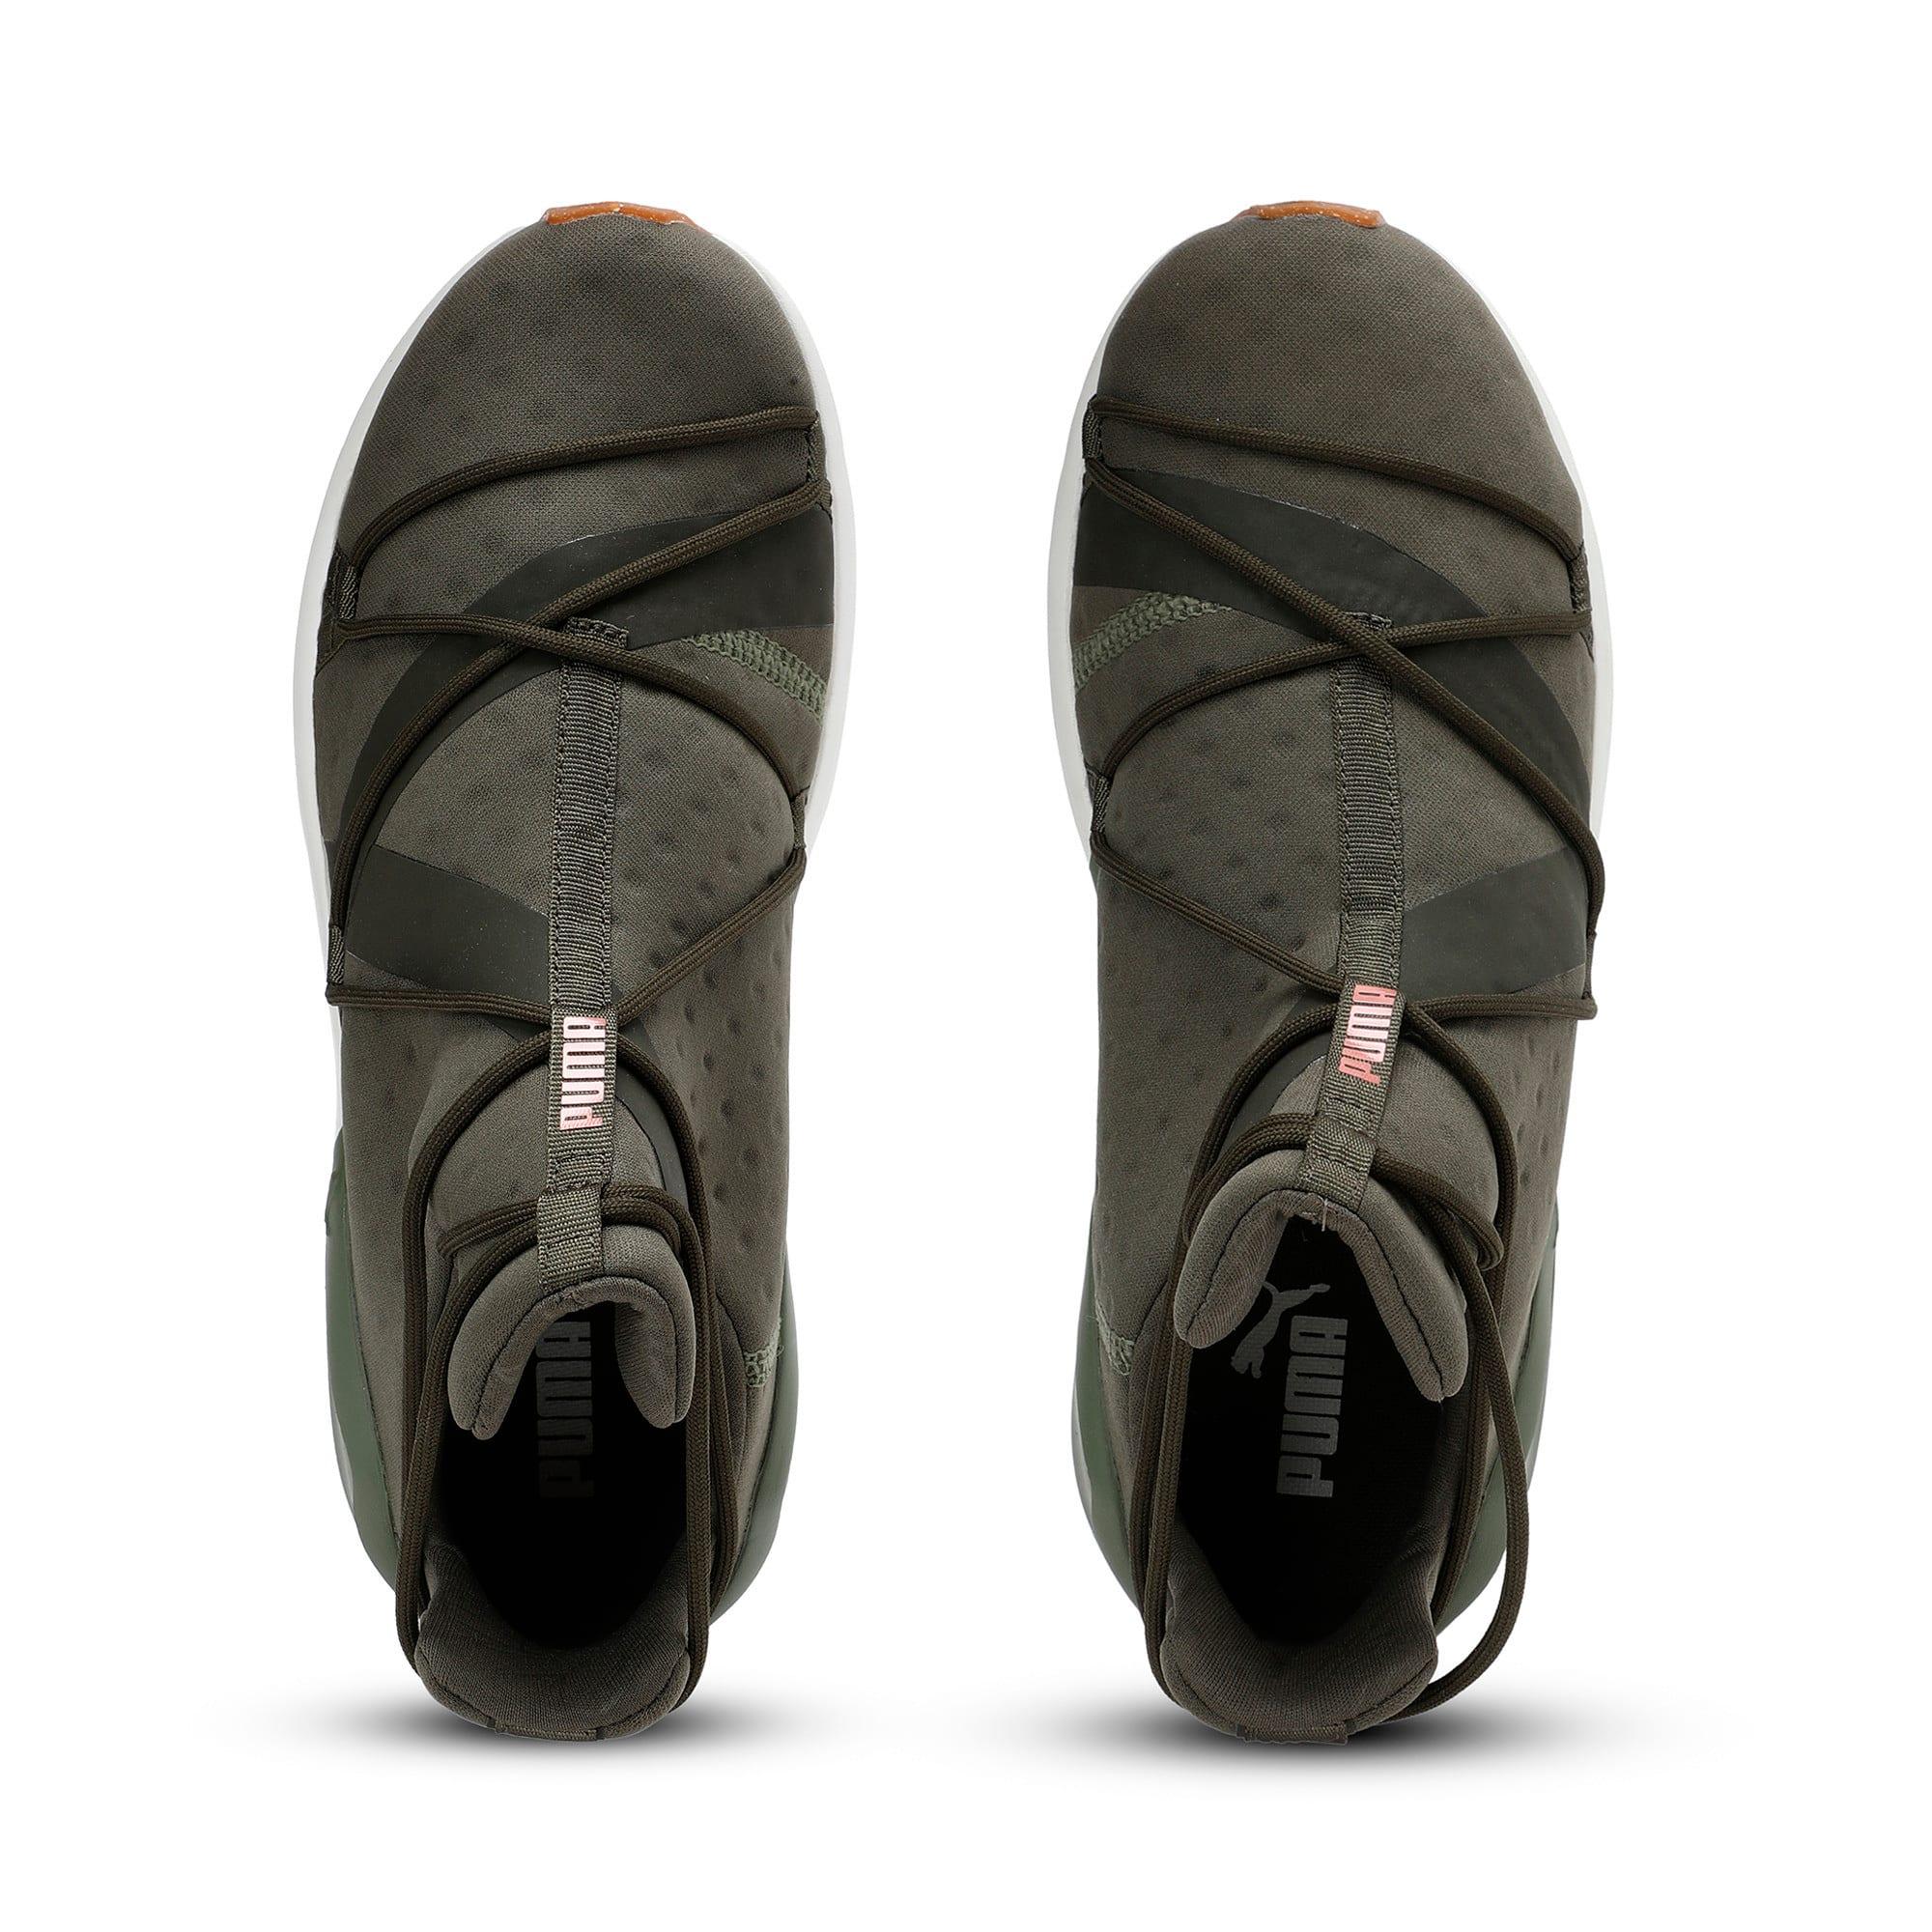 Thumbnail 6 of Fierce Rope VR Women's Training Shoes, Olive Night-Whisper White, medium-IND